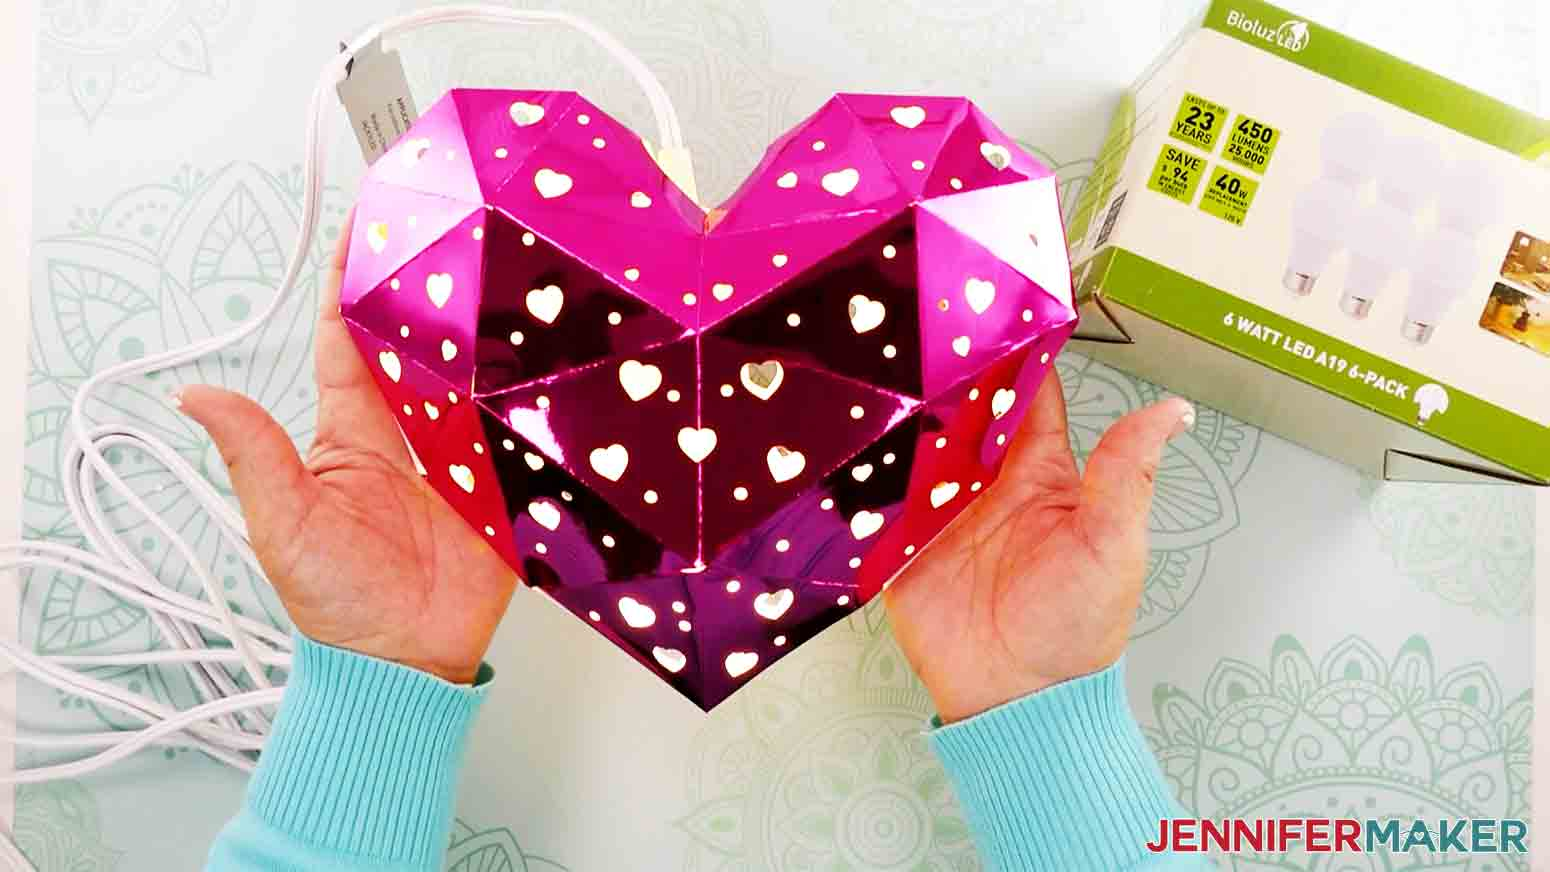 holding up the finished heart lantern